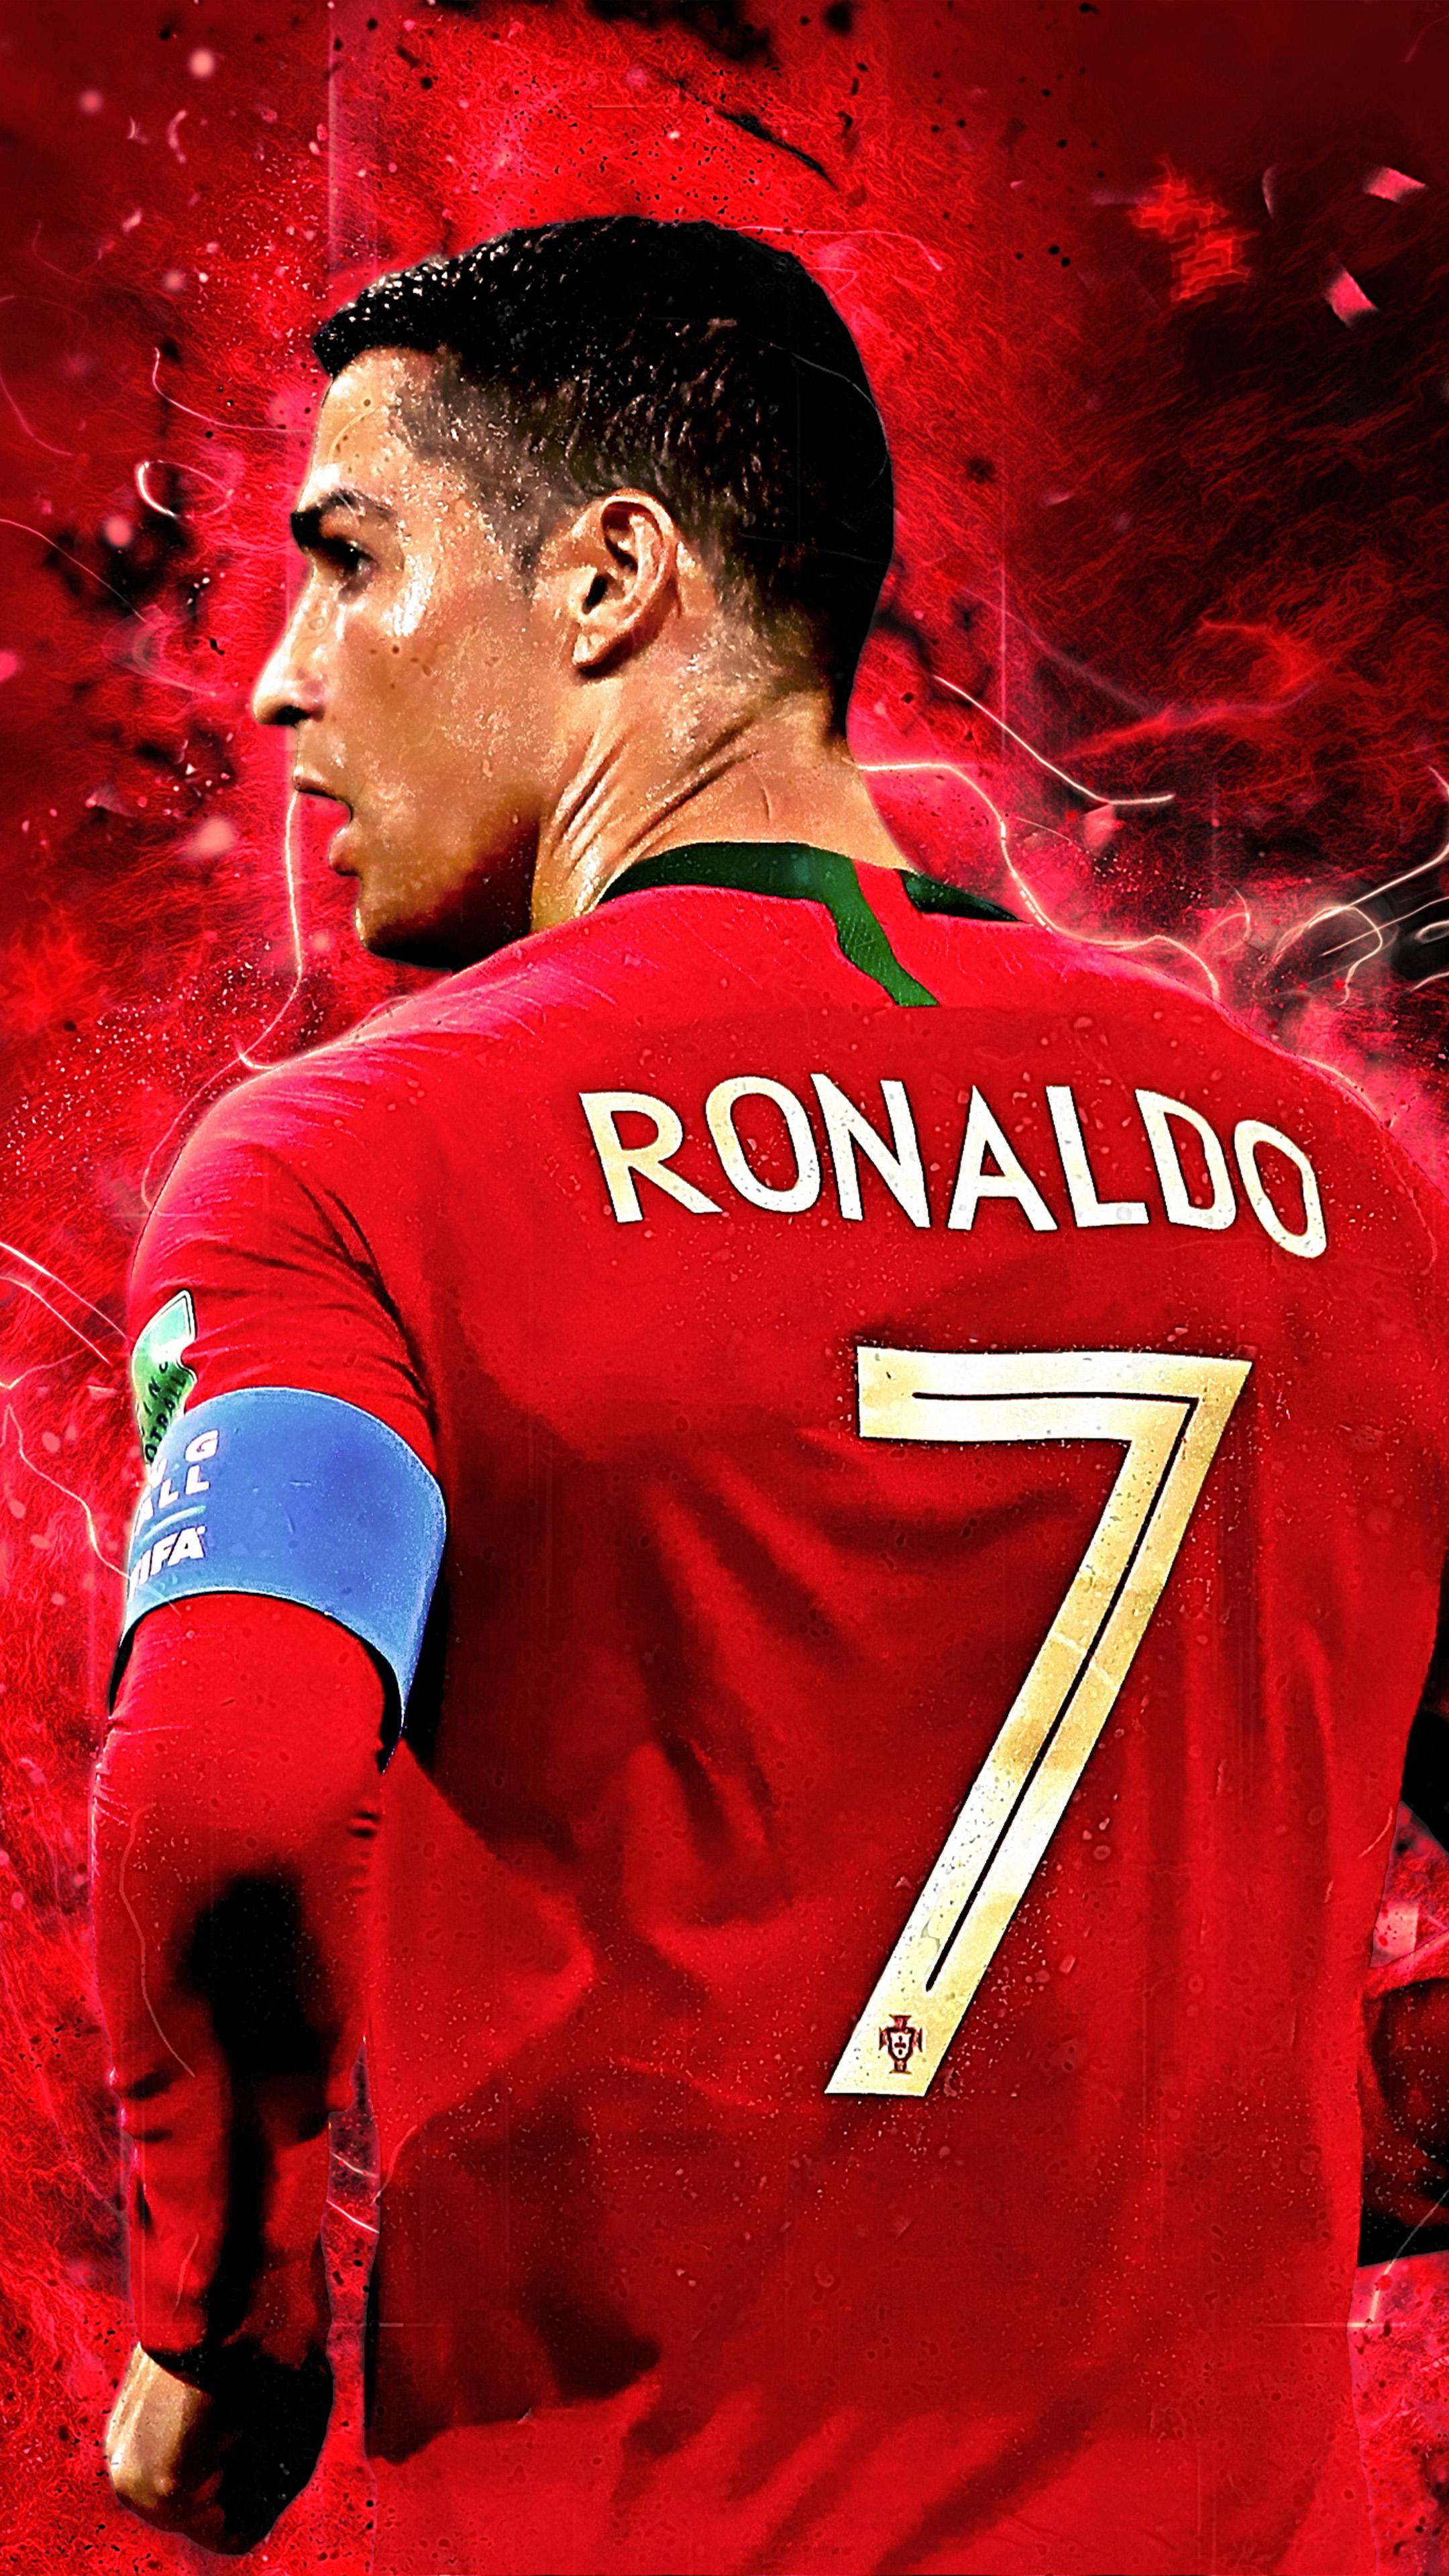 Cristiano Ronaldo Jersey Number 7 4k Ultra Hd Mobile Wallpaper